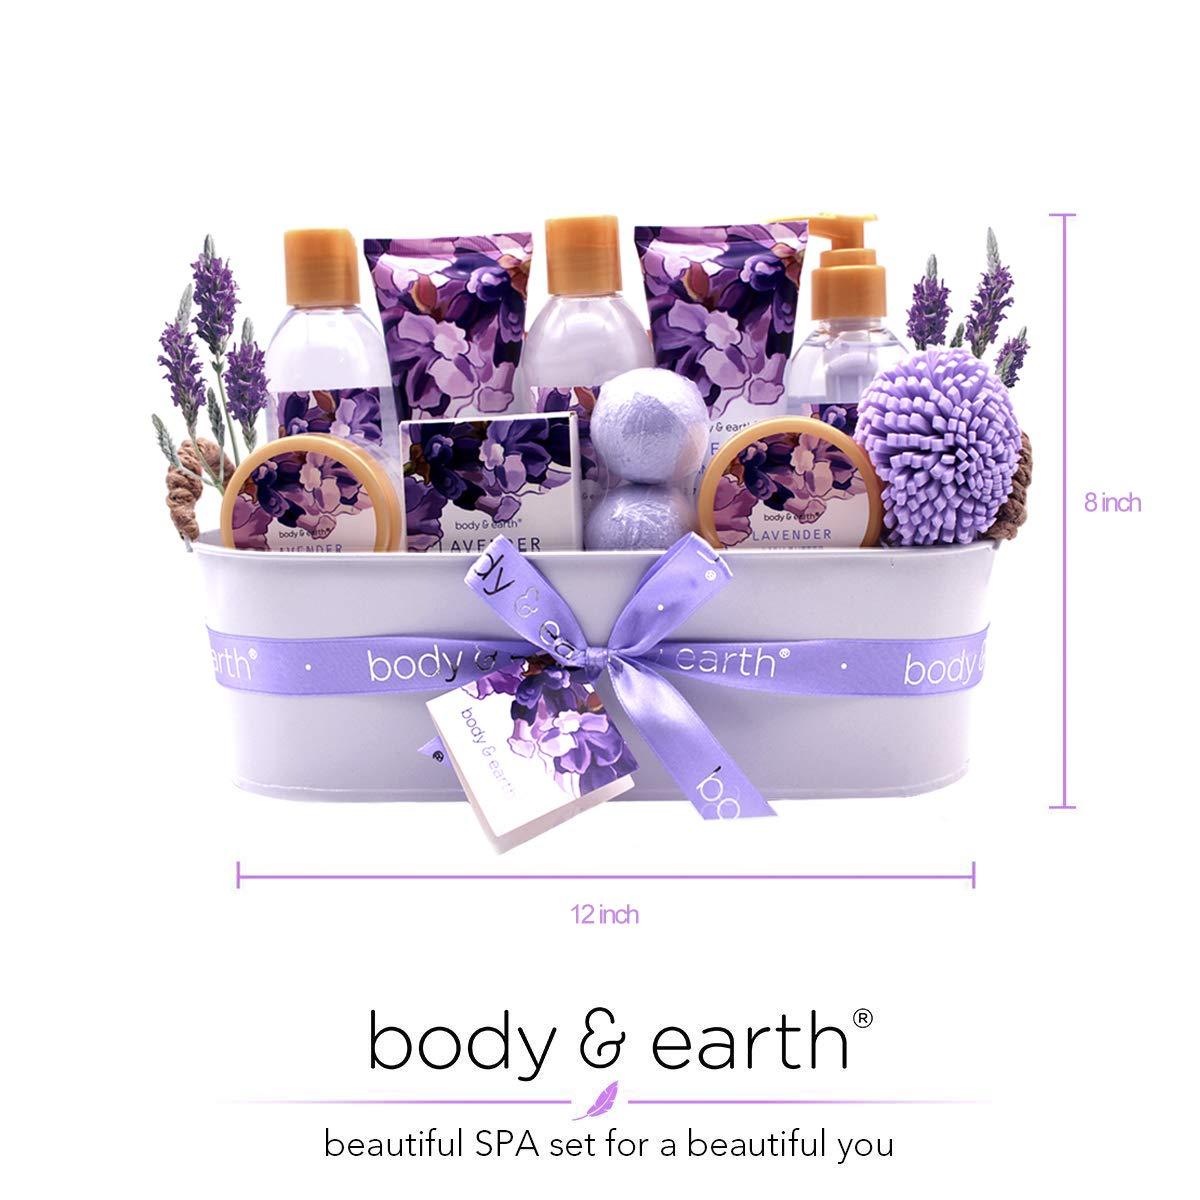 Body & Earth Bath Gift Set 12 Pcs Lavender Scented $16.19